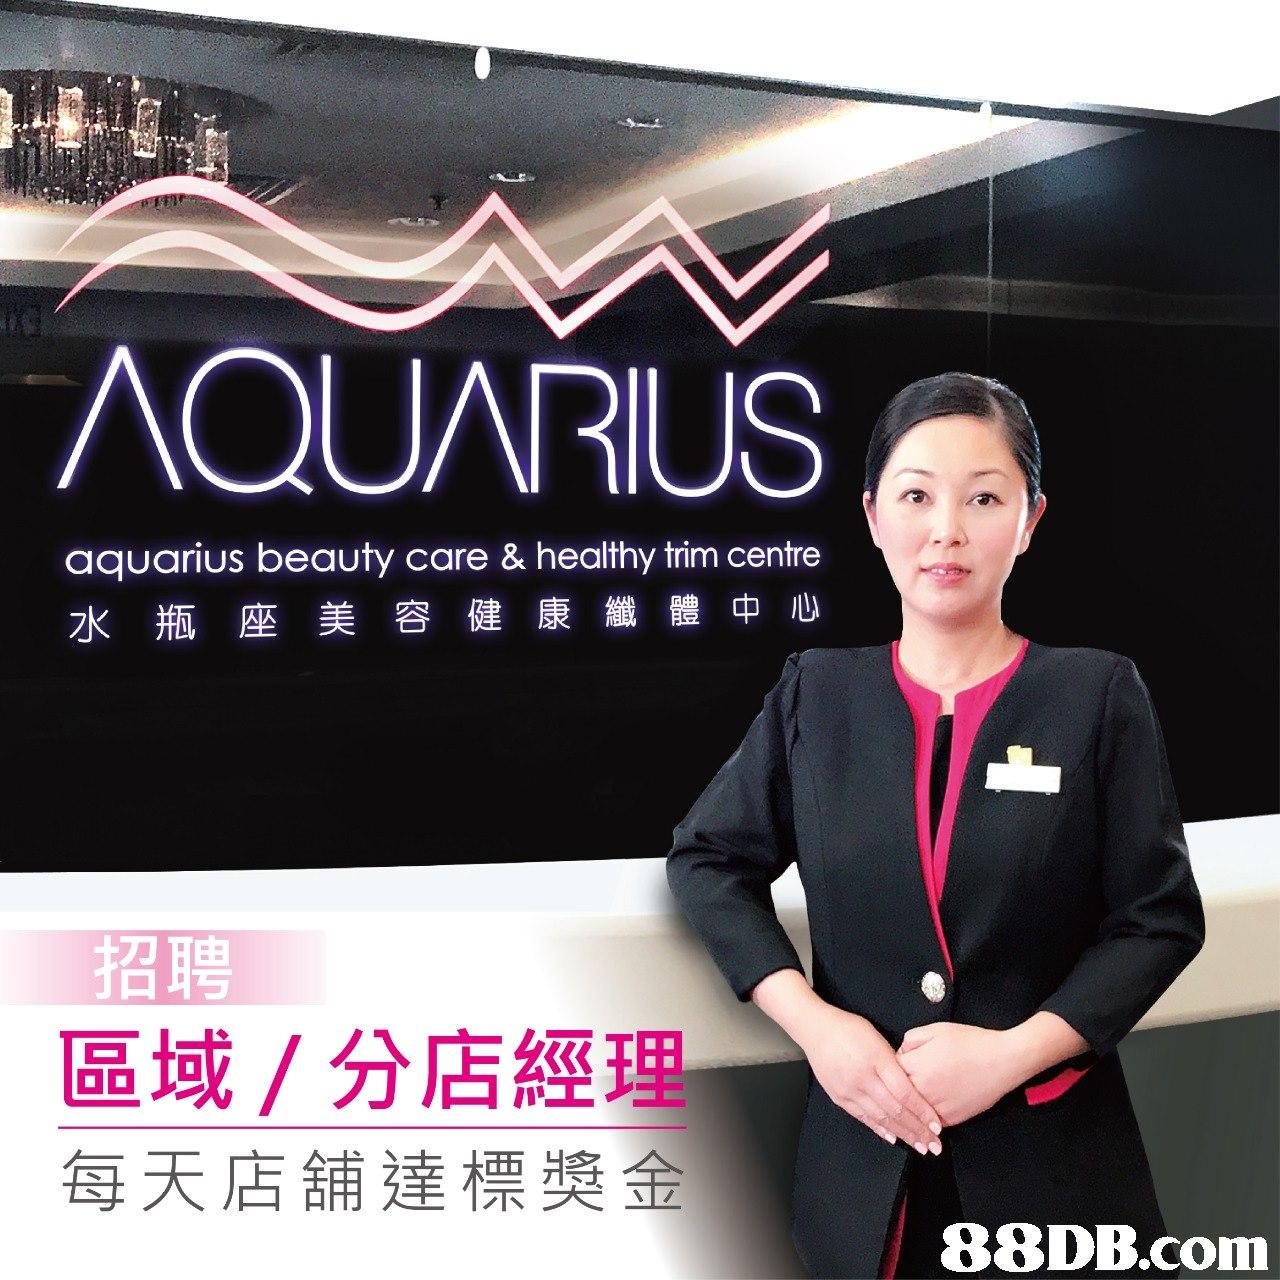 AQUARIUS aquarius beauty care & healthy trim centre 水瓶座美容健康纖體中心 區域〈分店經理 每天店舖達標奬金   Font